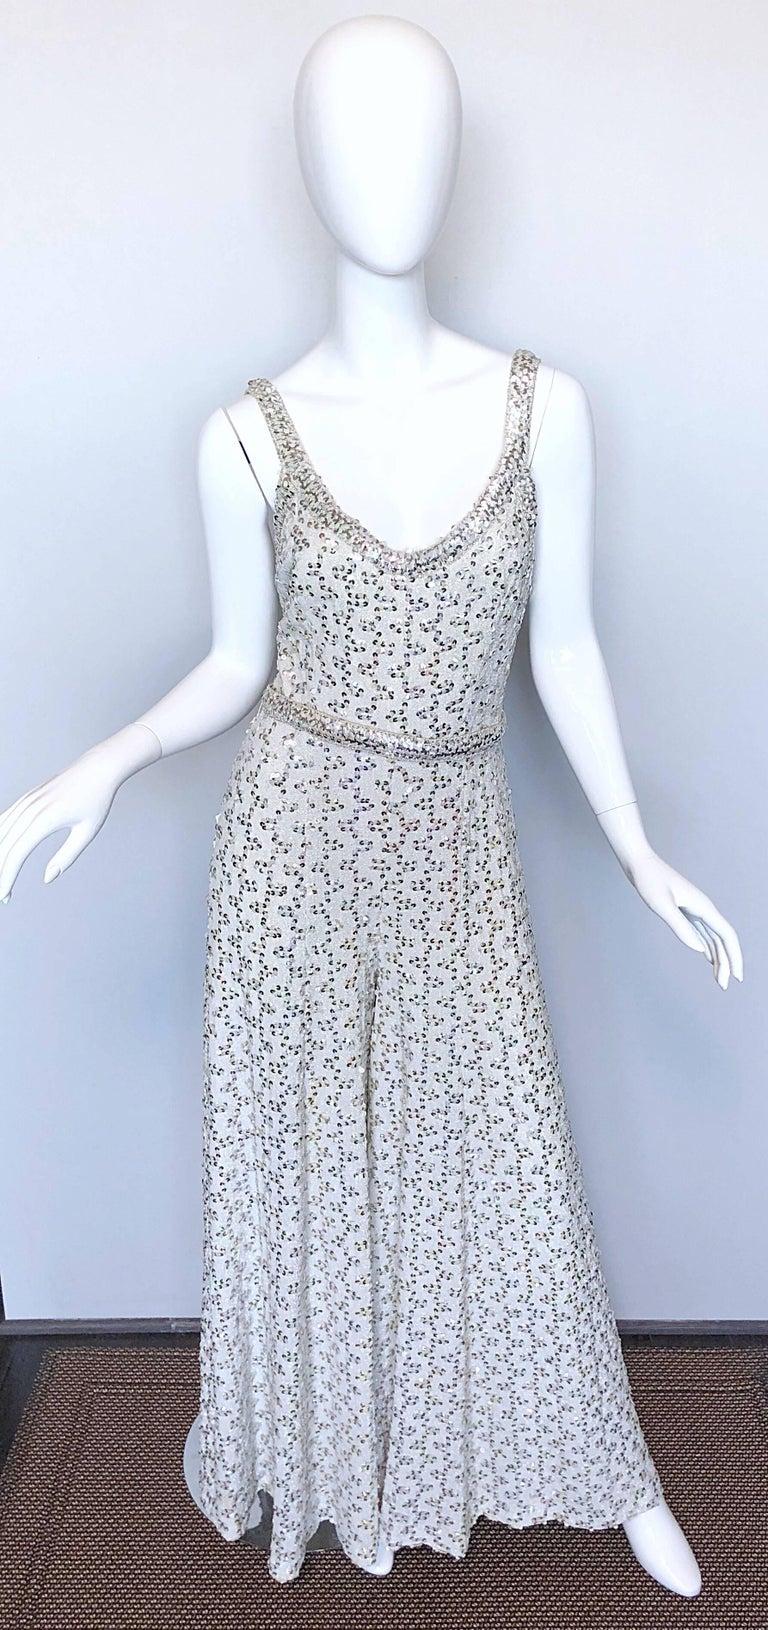 Vintage Lilli Diamond 1970s Silver Sequined 70s Amazing Lurex Wide Leg Jumpsuit For Sale 4